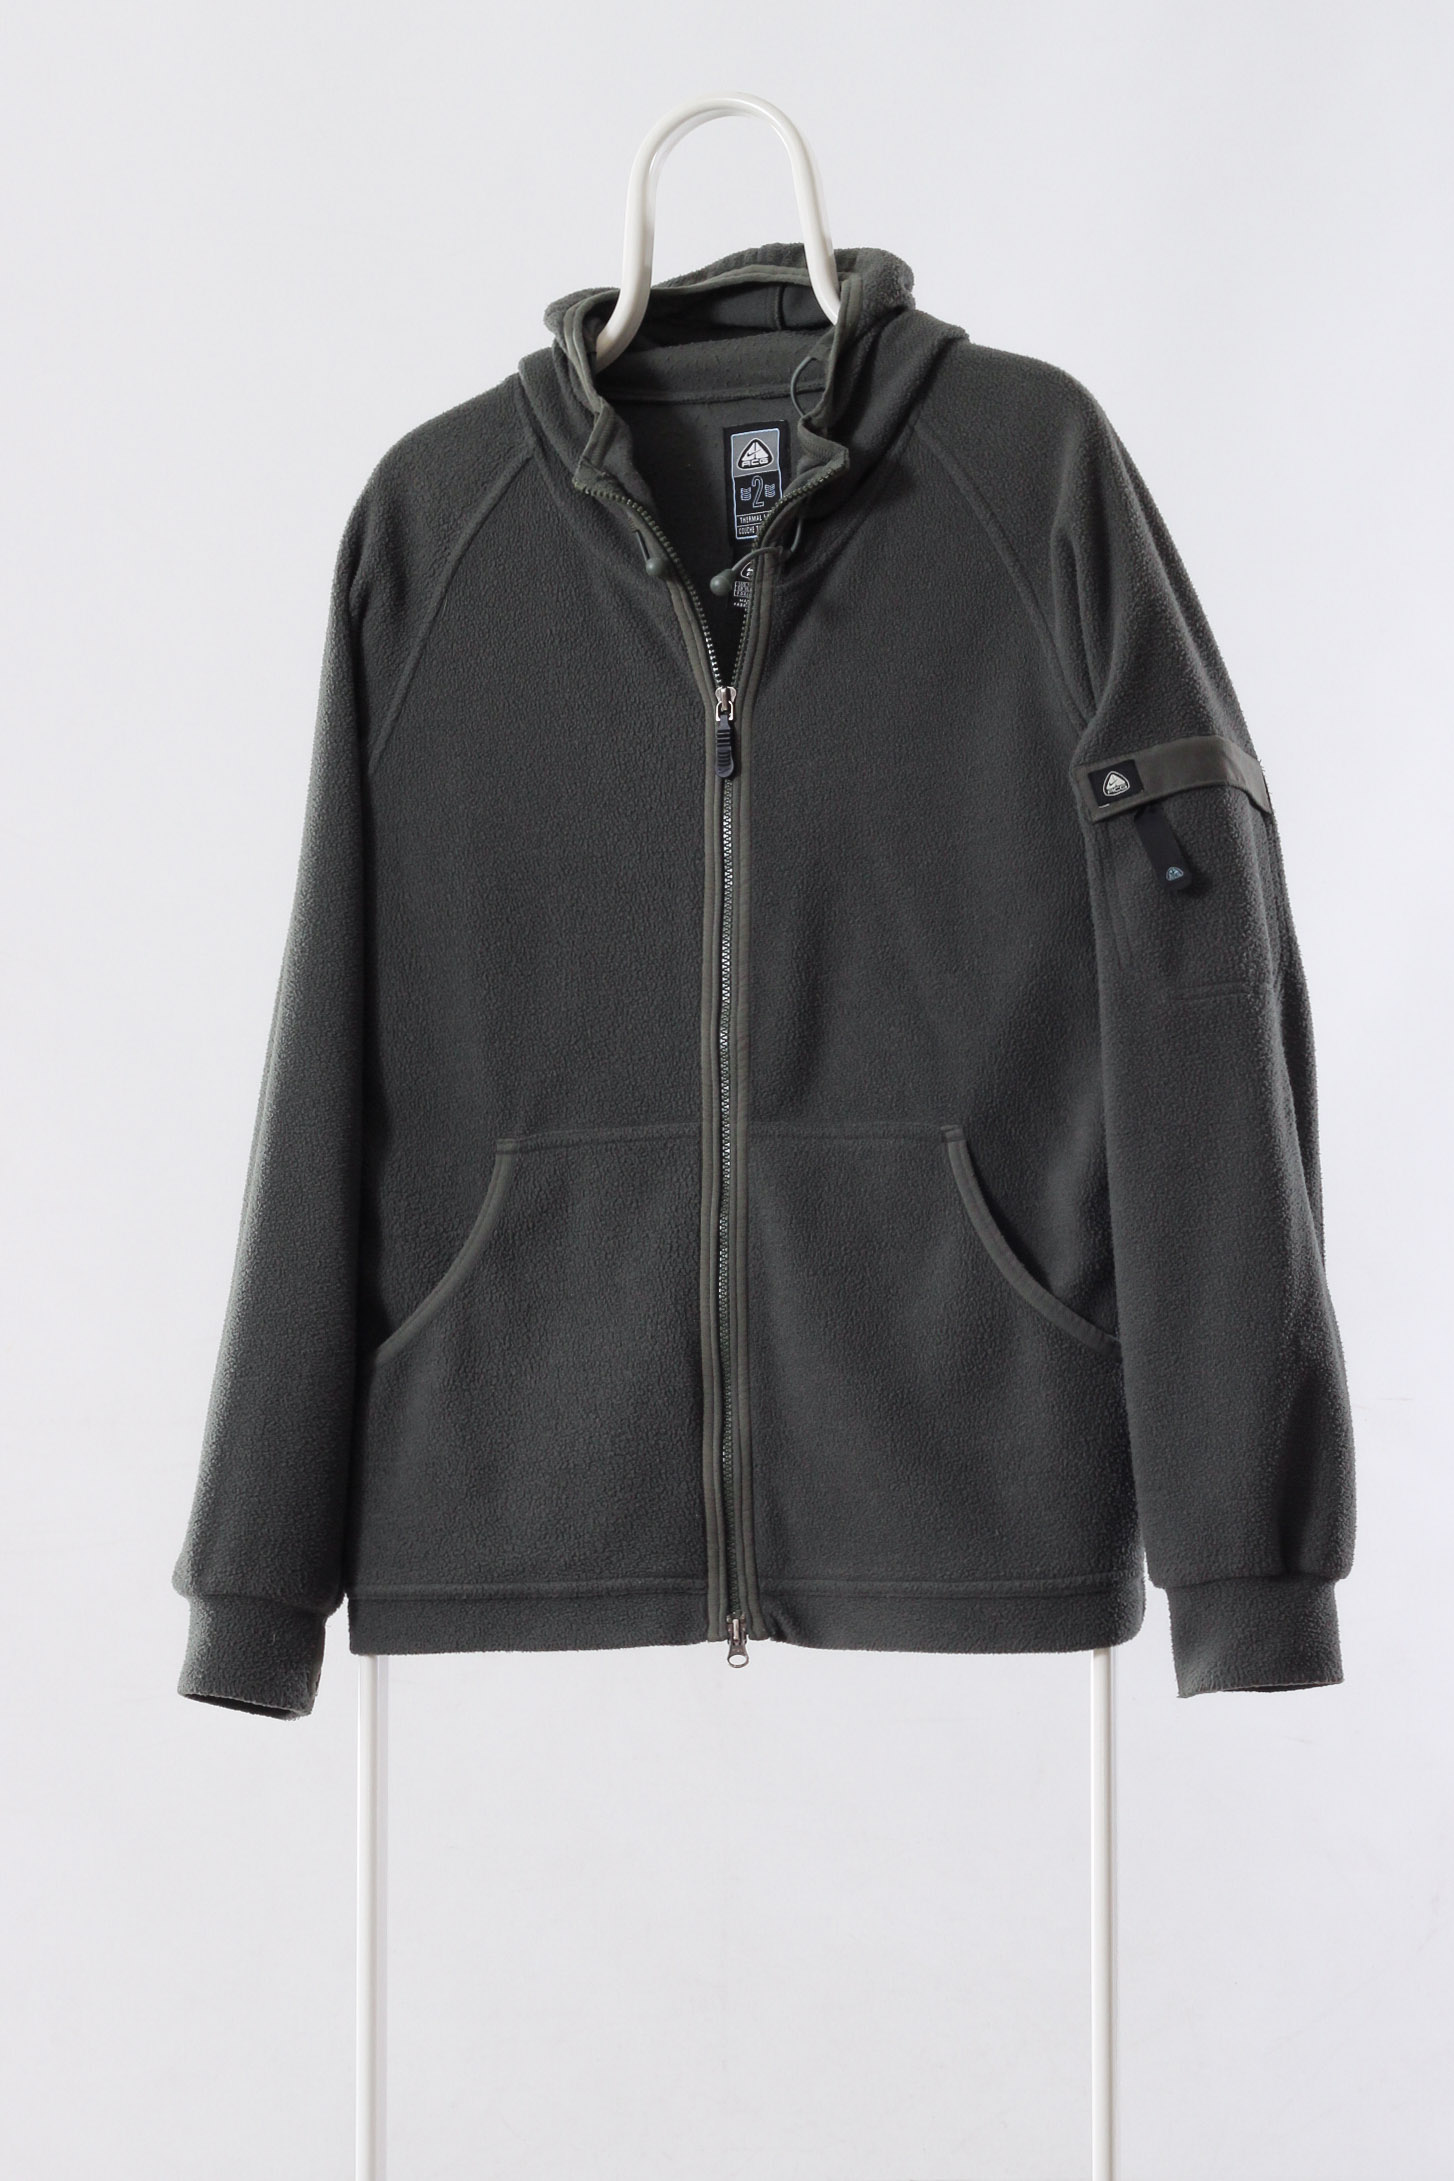 a977db3857b7b A0934FL - Vintage NIKE ACG Fleece Hoodie Jacket Full Zip Green Size S